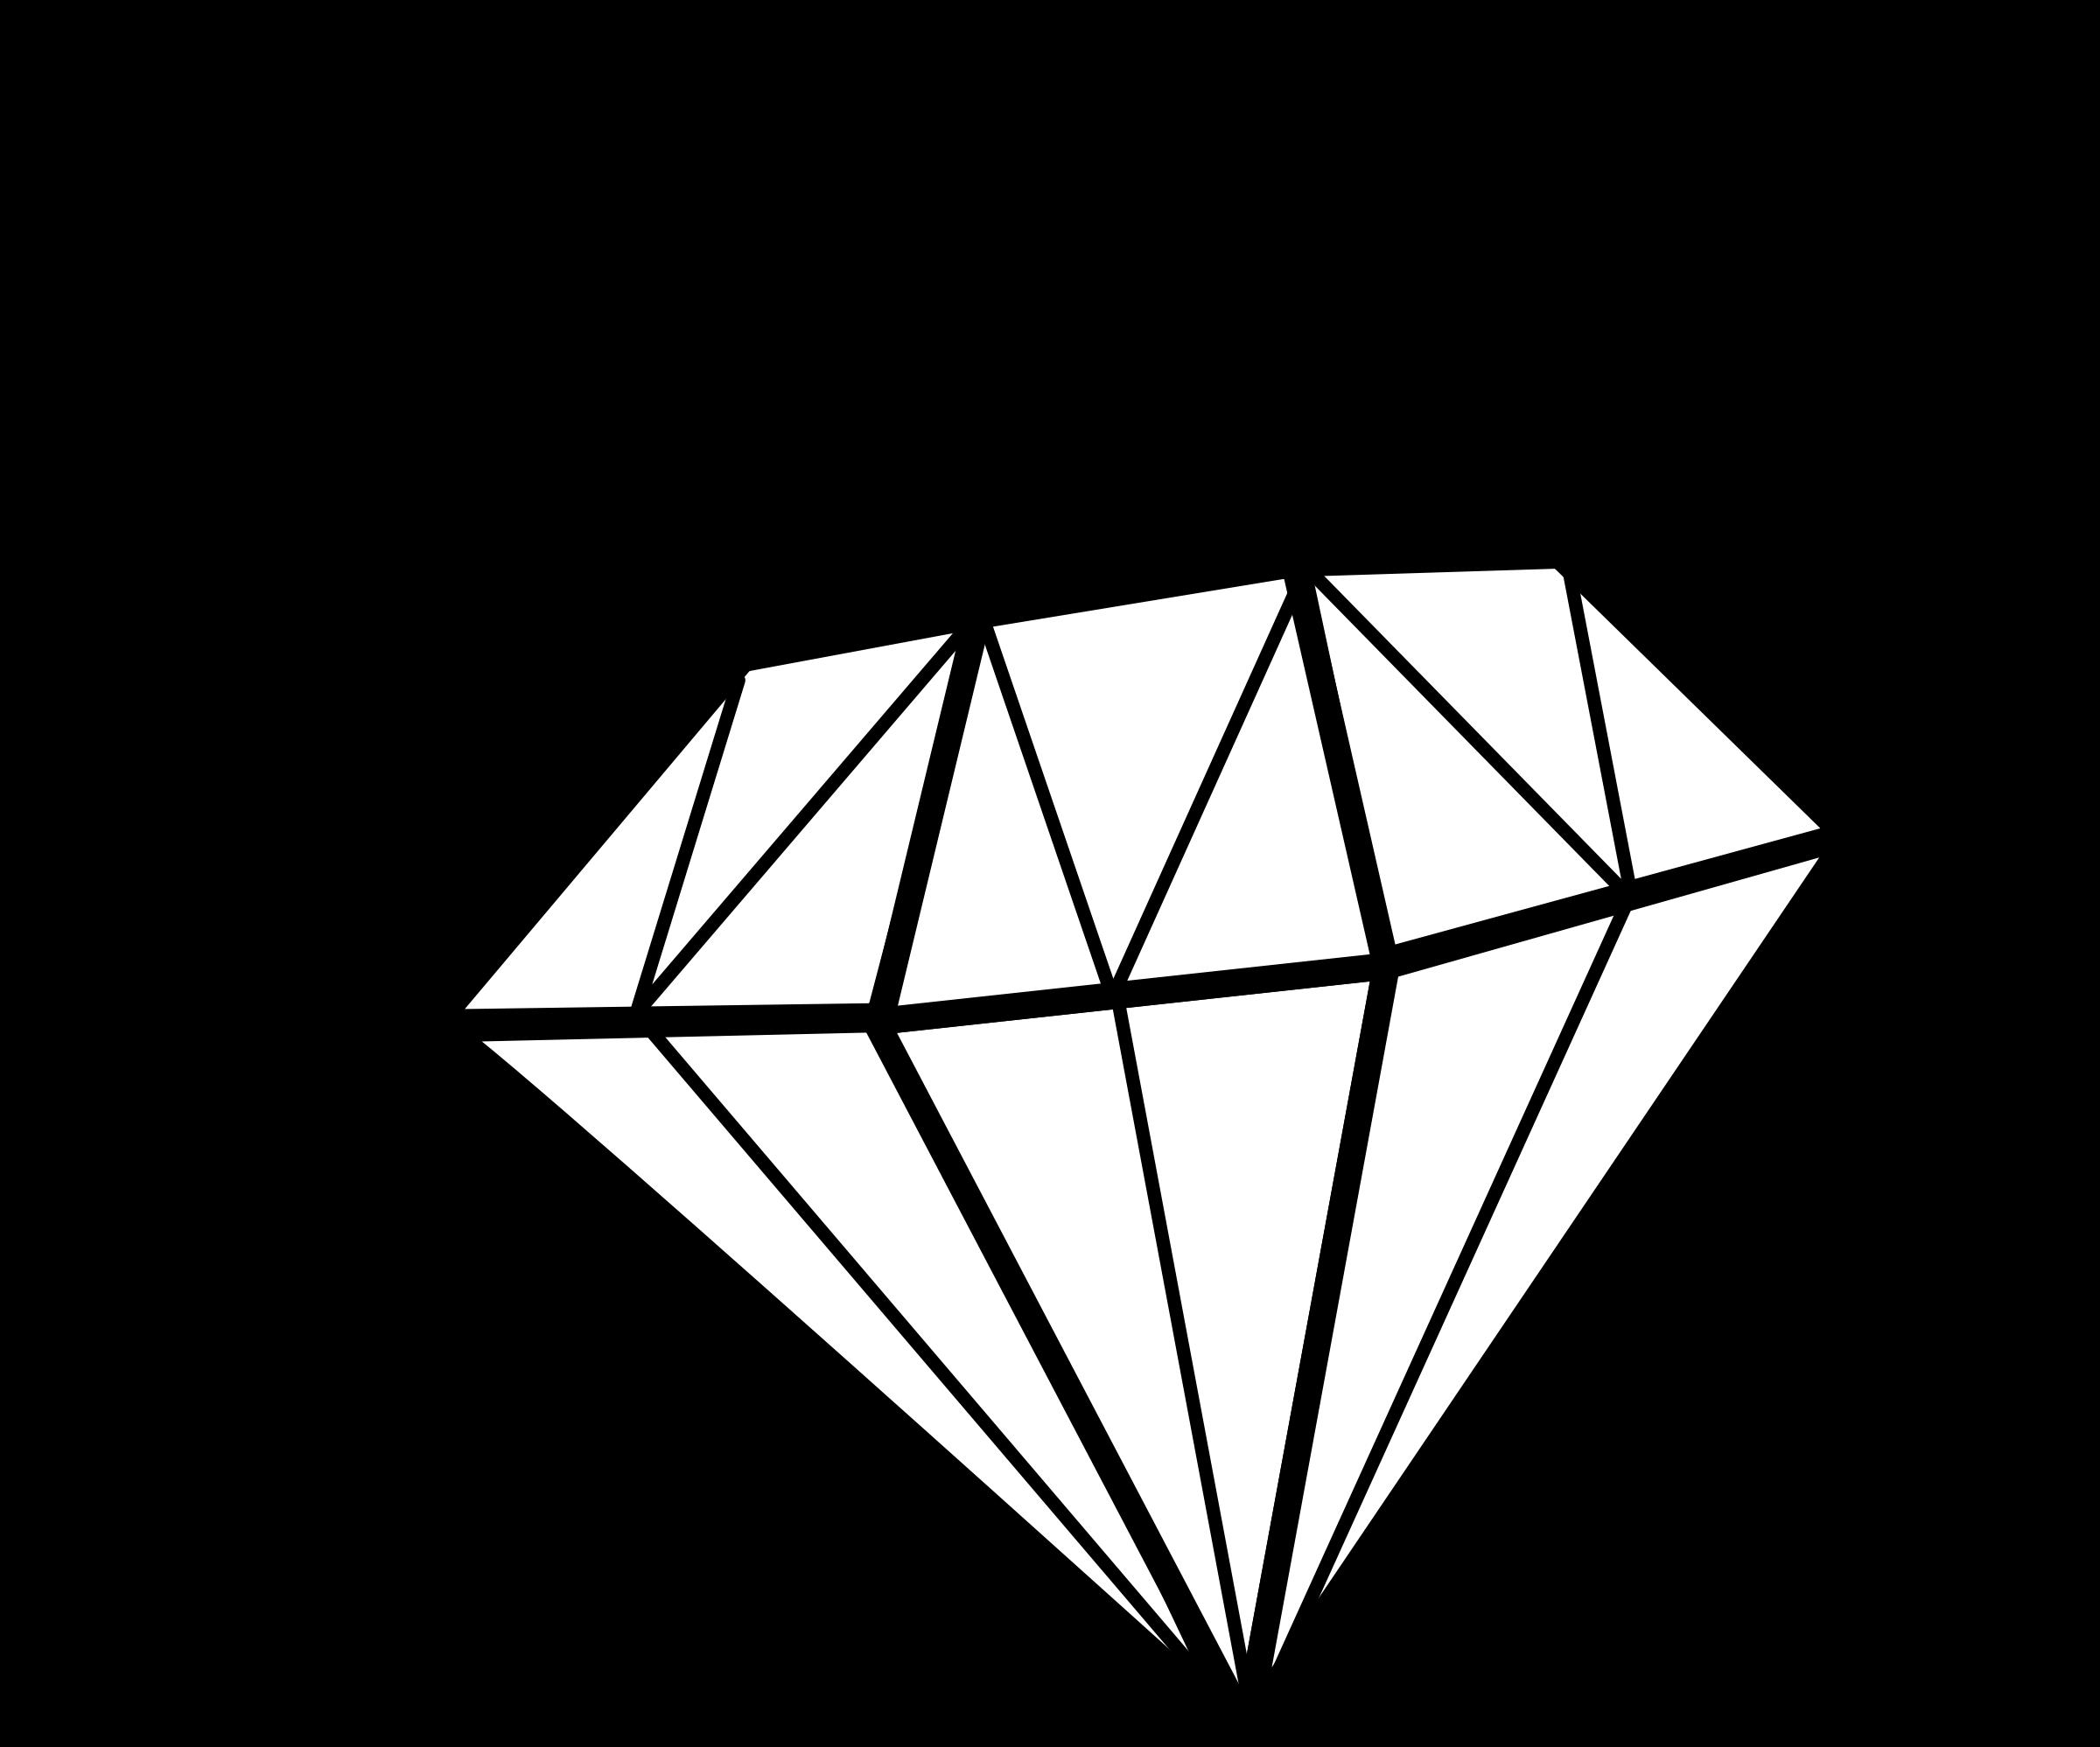 Diamond Clip Art-Diamond Clip Art-7